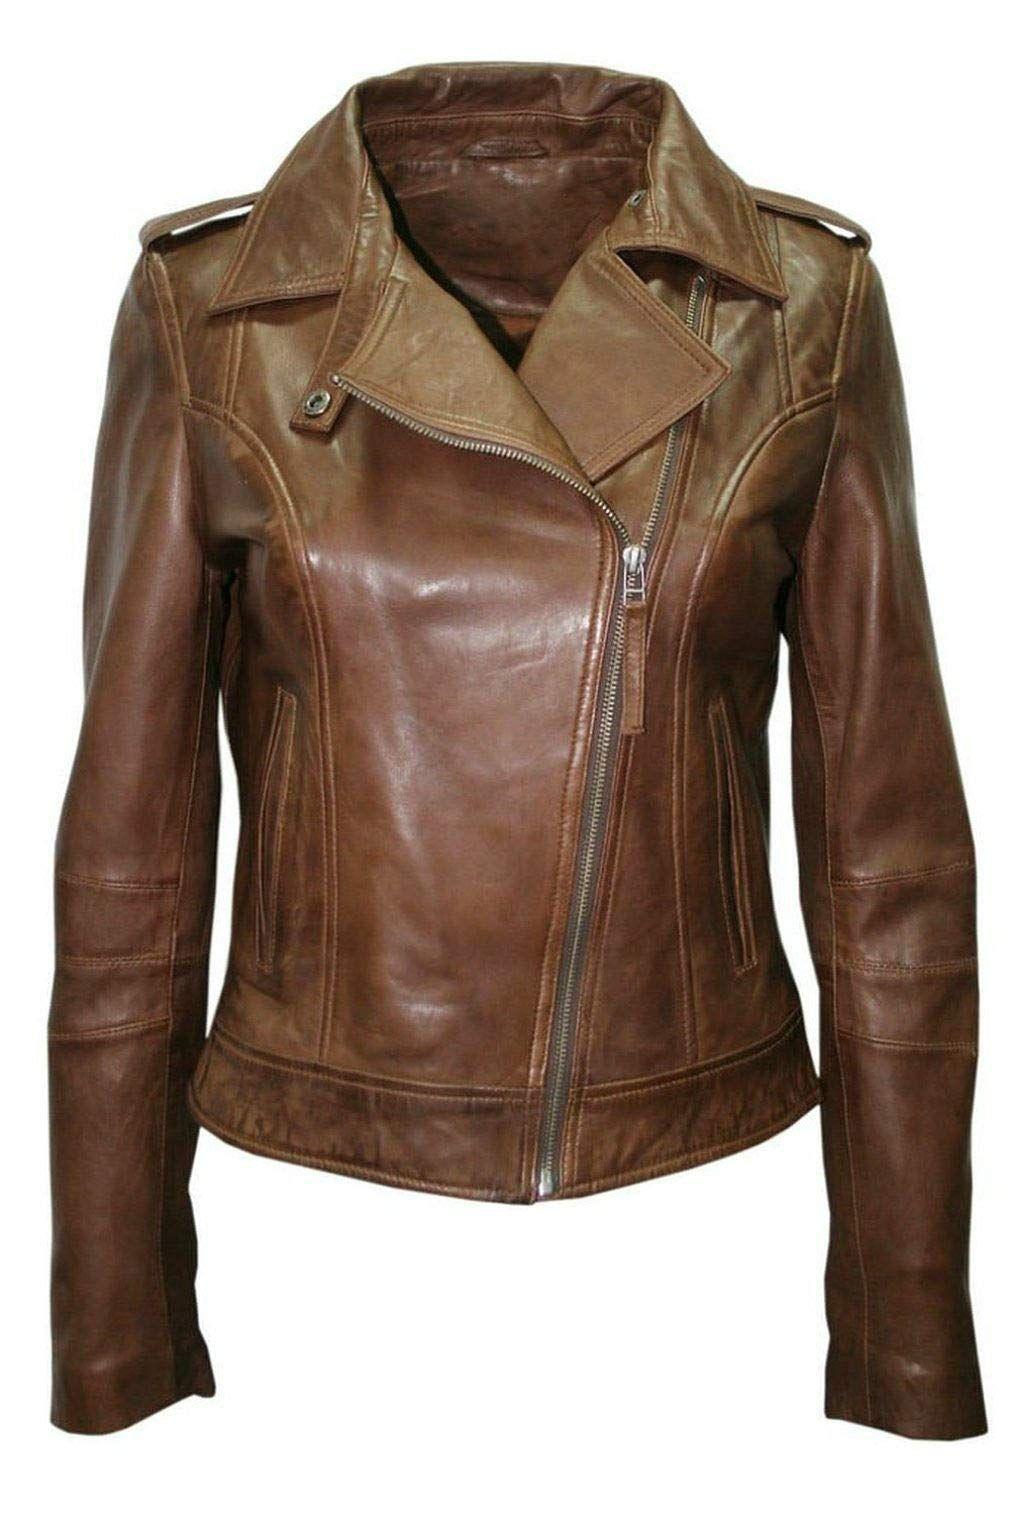 Womens Leather Jacket Bomber Motorcycle Biker Real Lambskin Leather Jacket For Womens Brow Leather Jackets Women Stylish Leather Jacket Lambskin Leather Jacket [ 1515 x 1009 Pixel ]